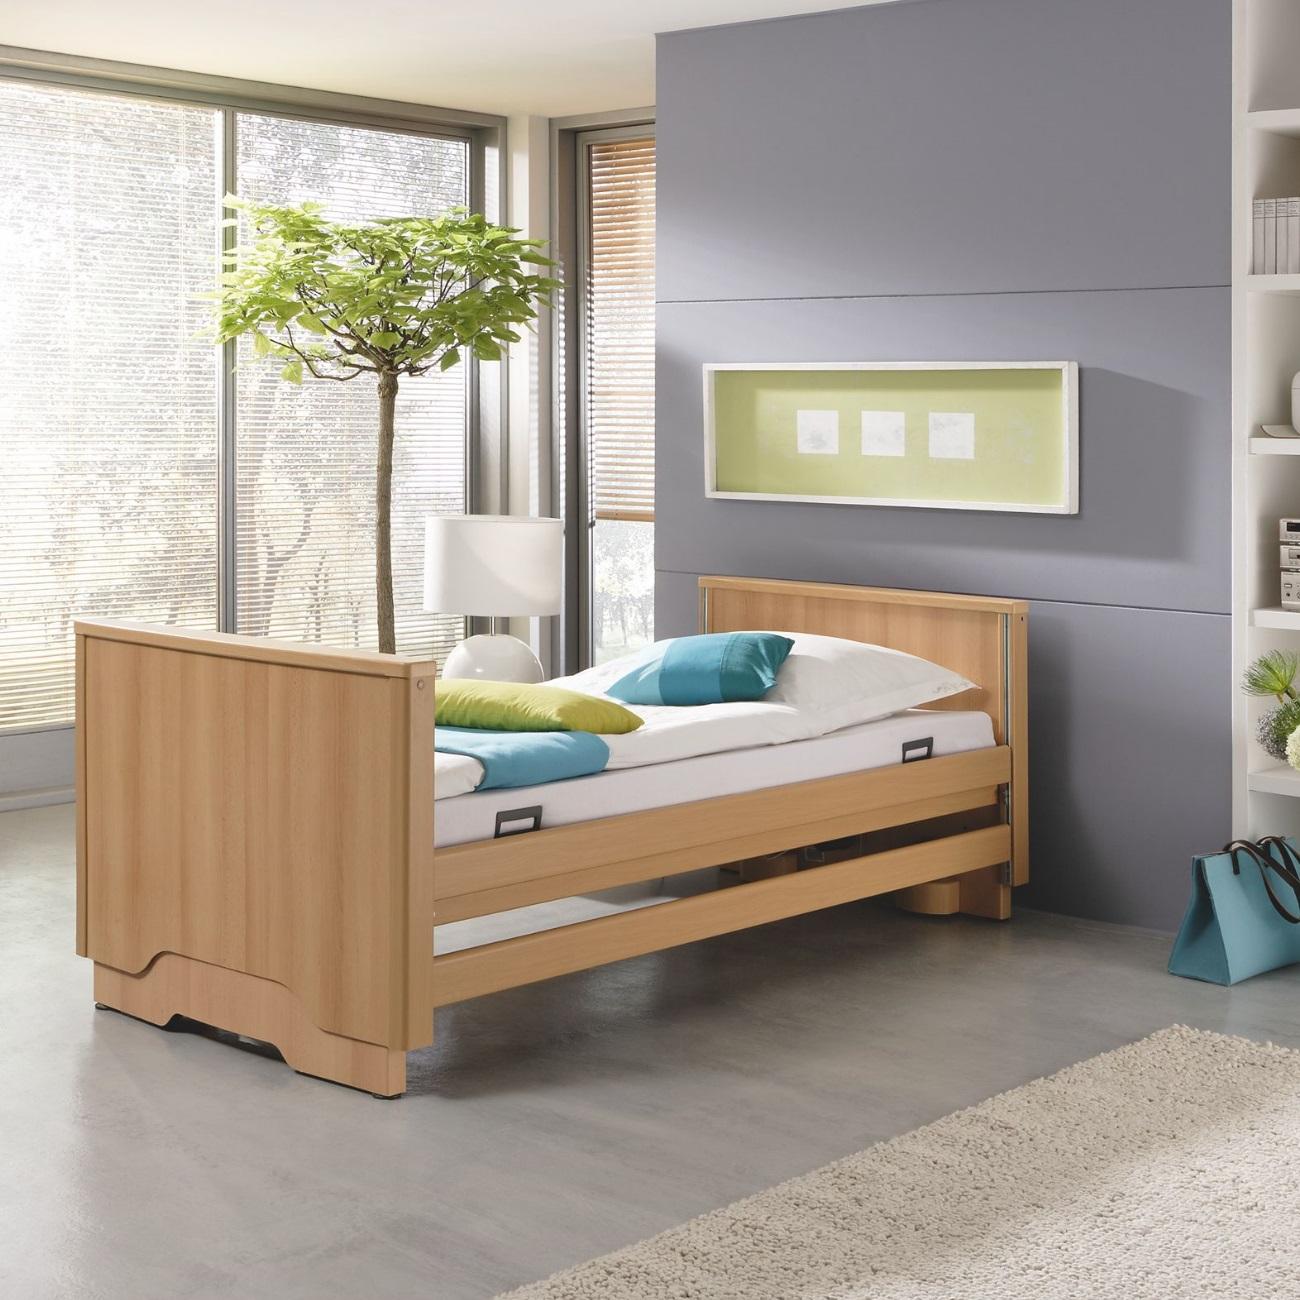 das pflegebett burmeier royal verbindet funktion mit optik online sanit tshaus. Black Bedroom Furniture Sets. Home Design Ideas